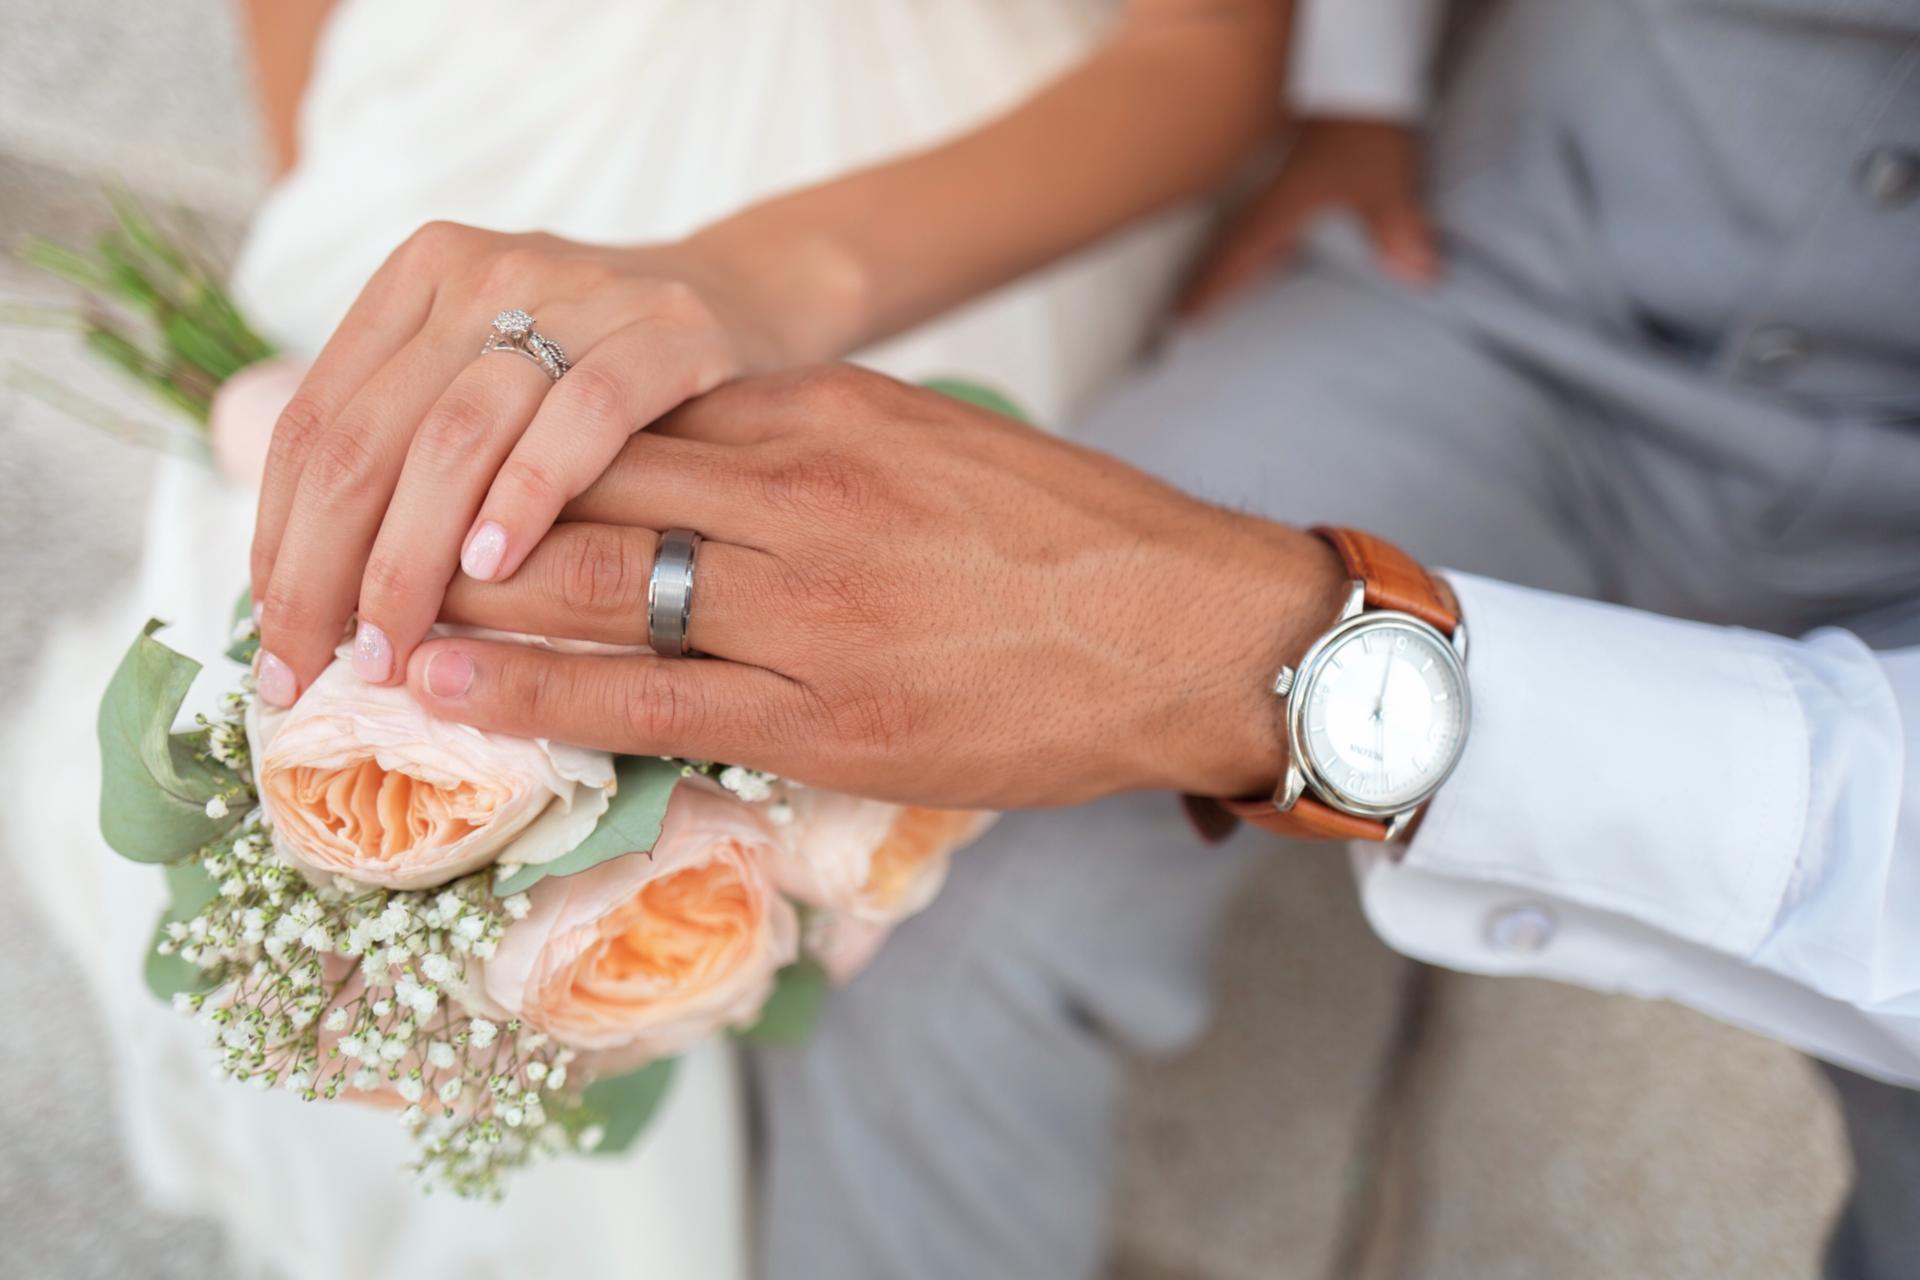 heiraten (c) www.pixabay.com